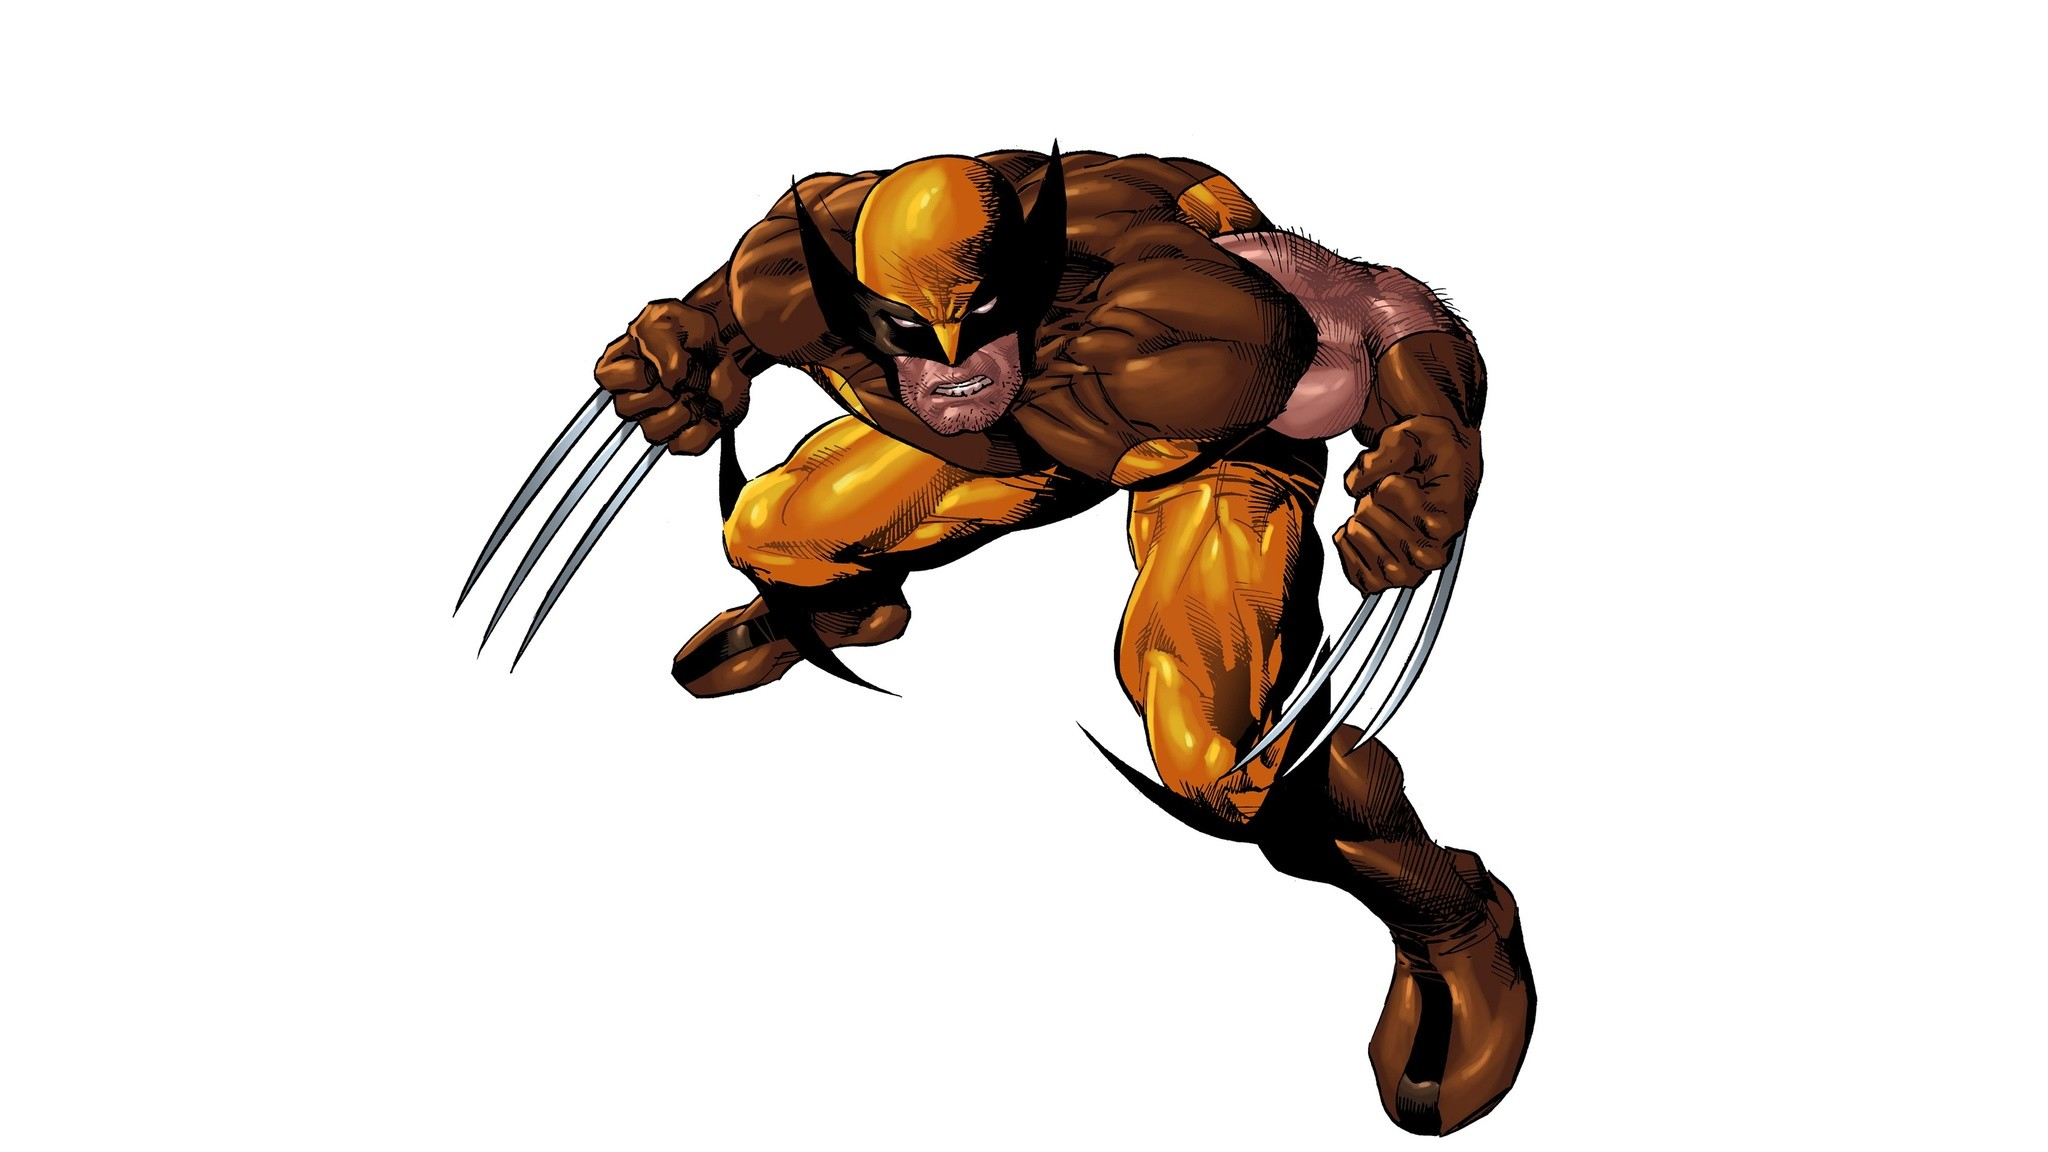 Res: 2048x1152, x-men-marvel-comics-wolverine-bf.jpg